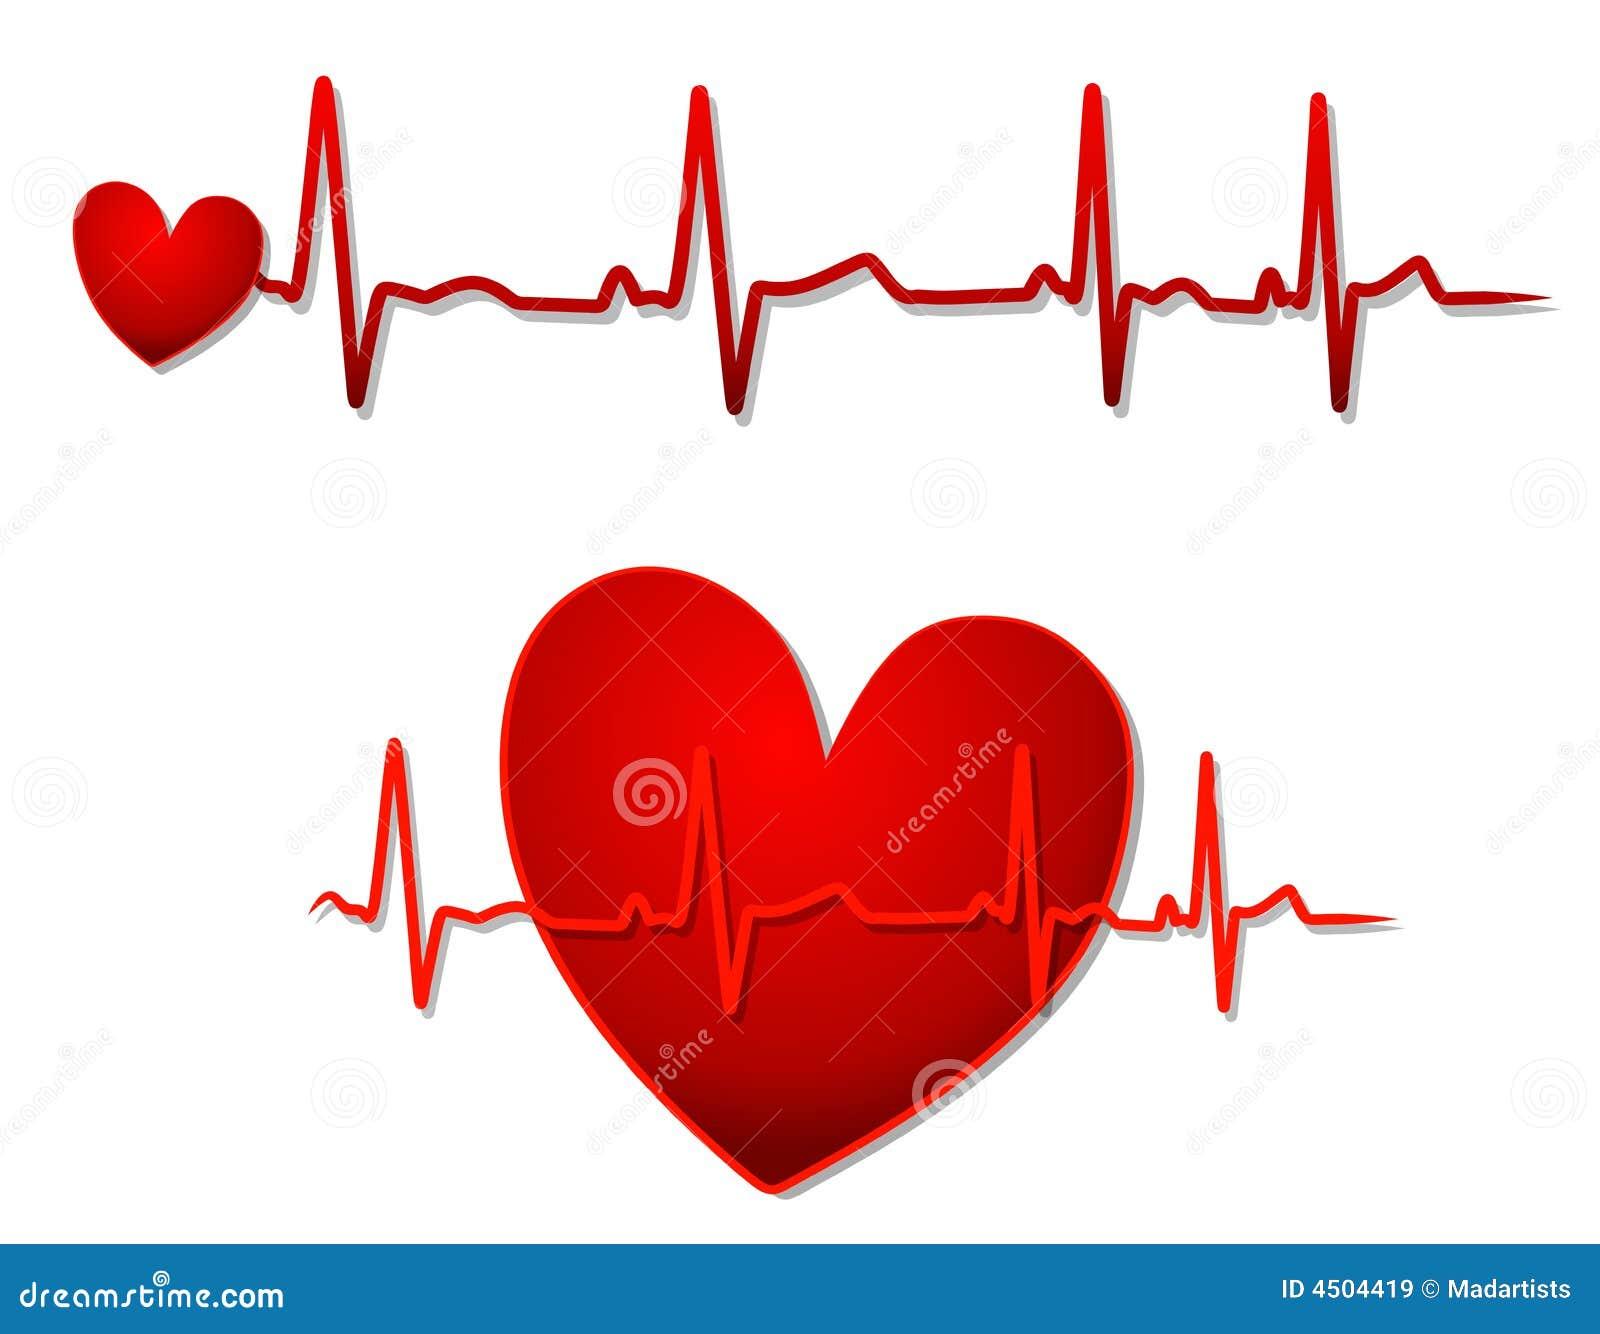 free heart monitor clipart - photo #14